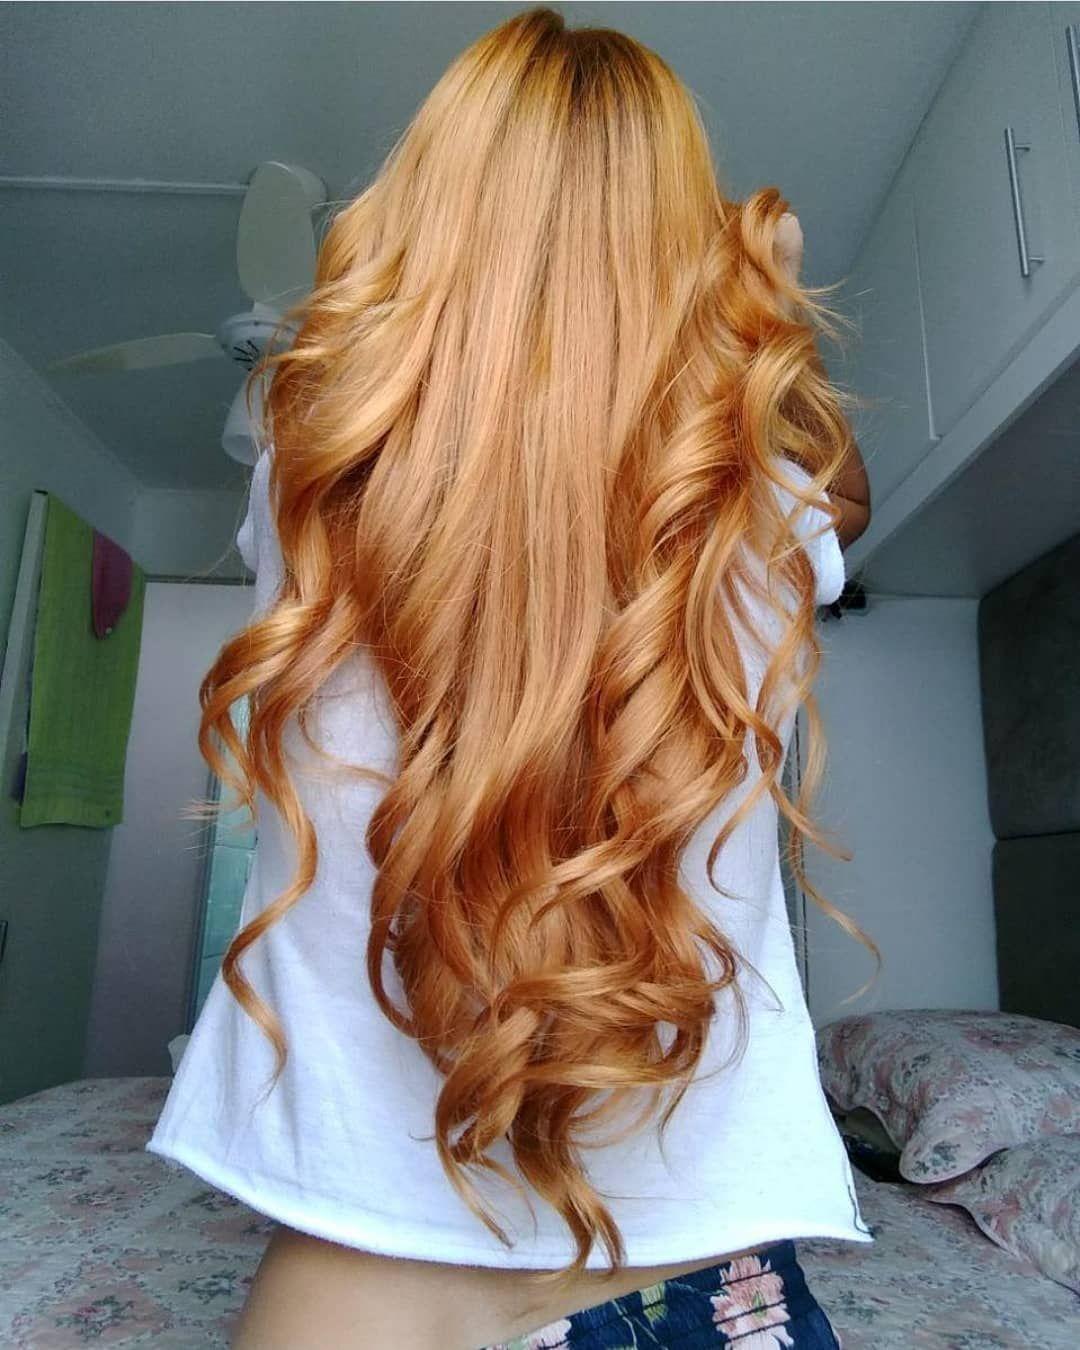 Sexiest Hair Sexiesthair Instagram Photos And Videos Hair Styles Long Hair Styles Beautiful Long Hair